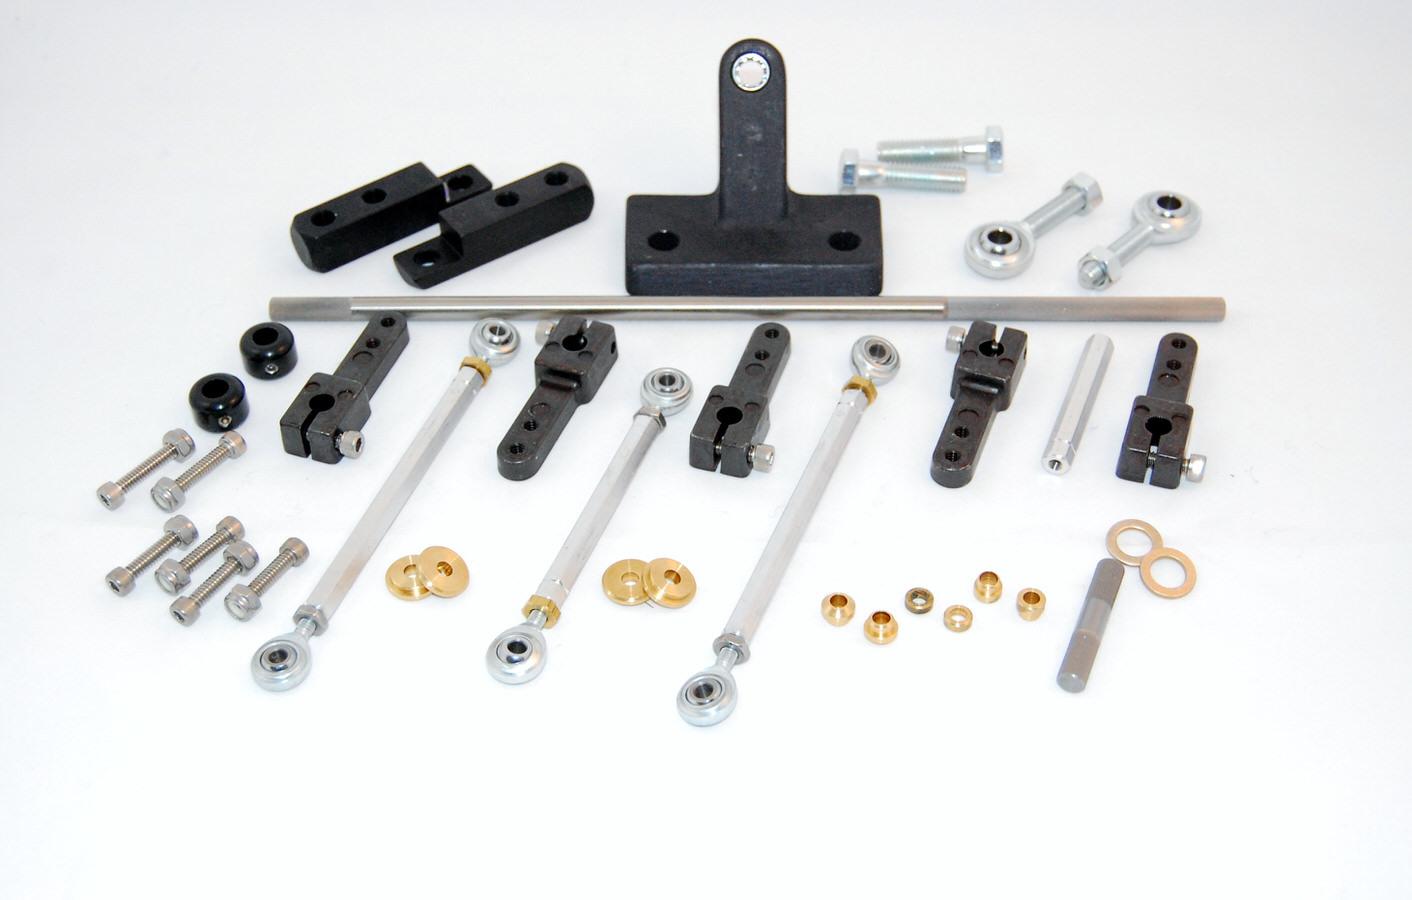 Advanced Engine Design Pro Tunnel Ram Linkage Kit - SBC